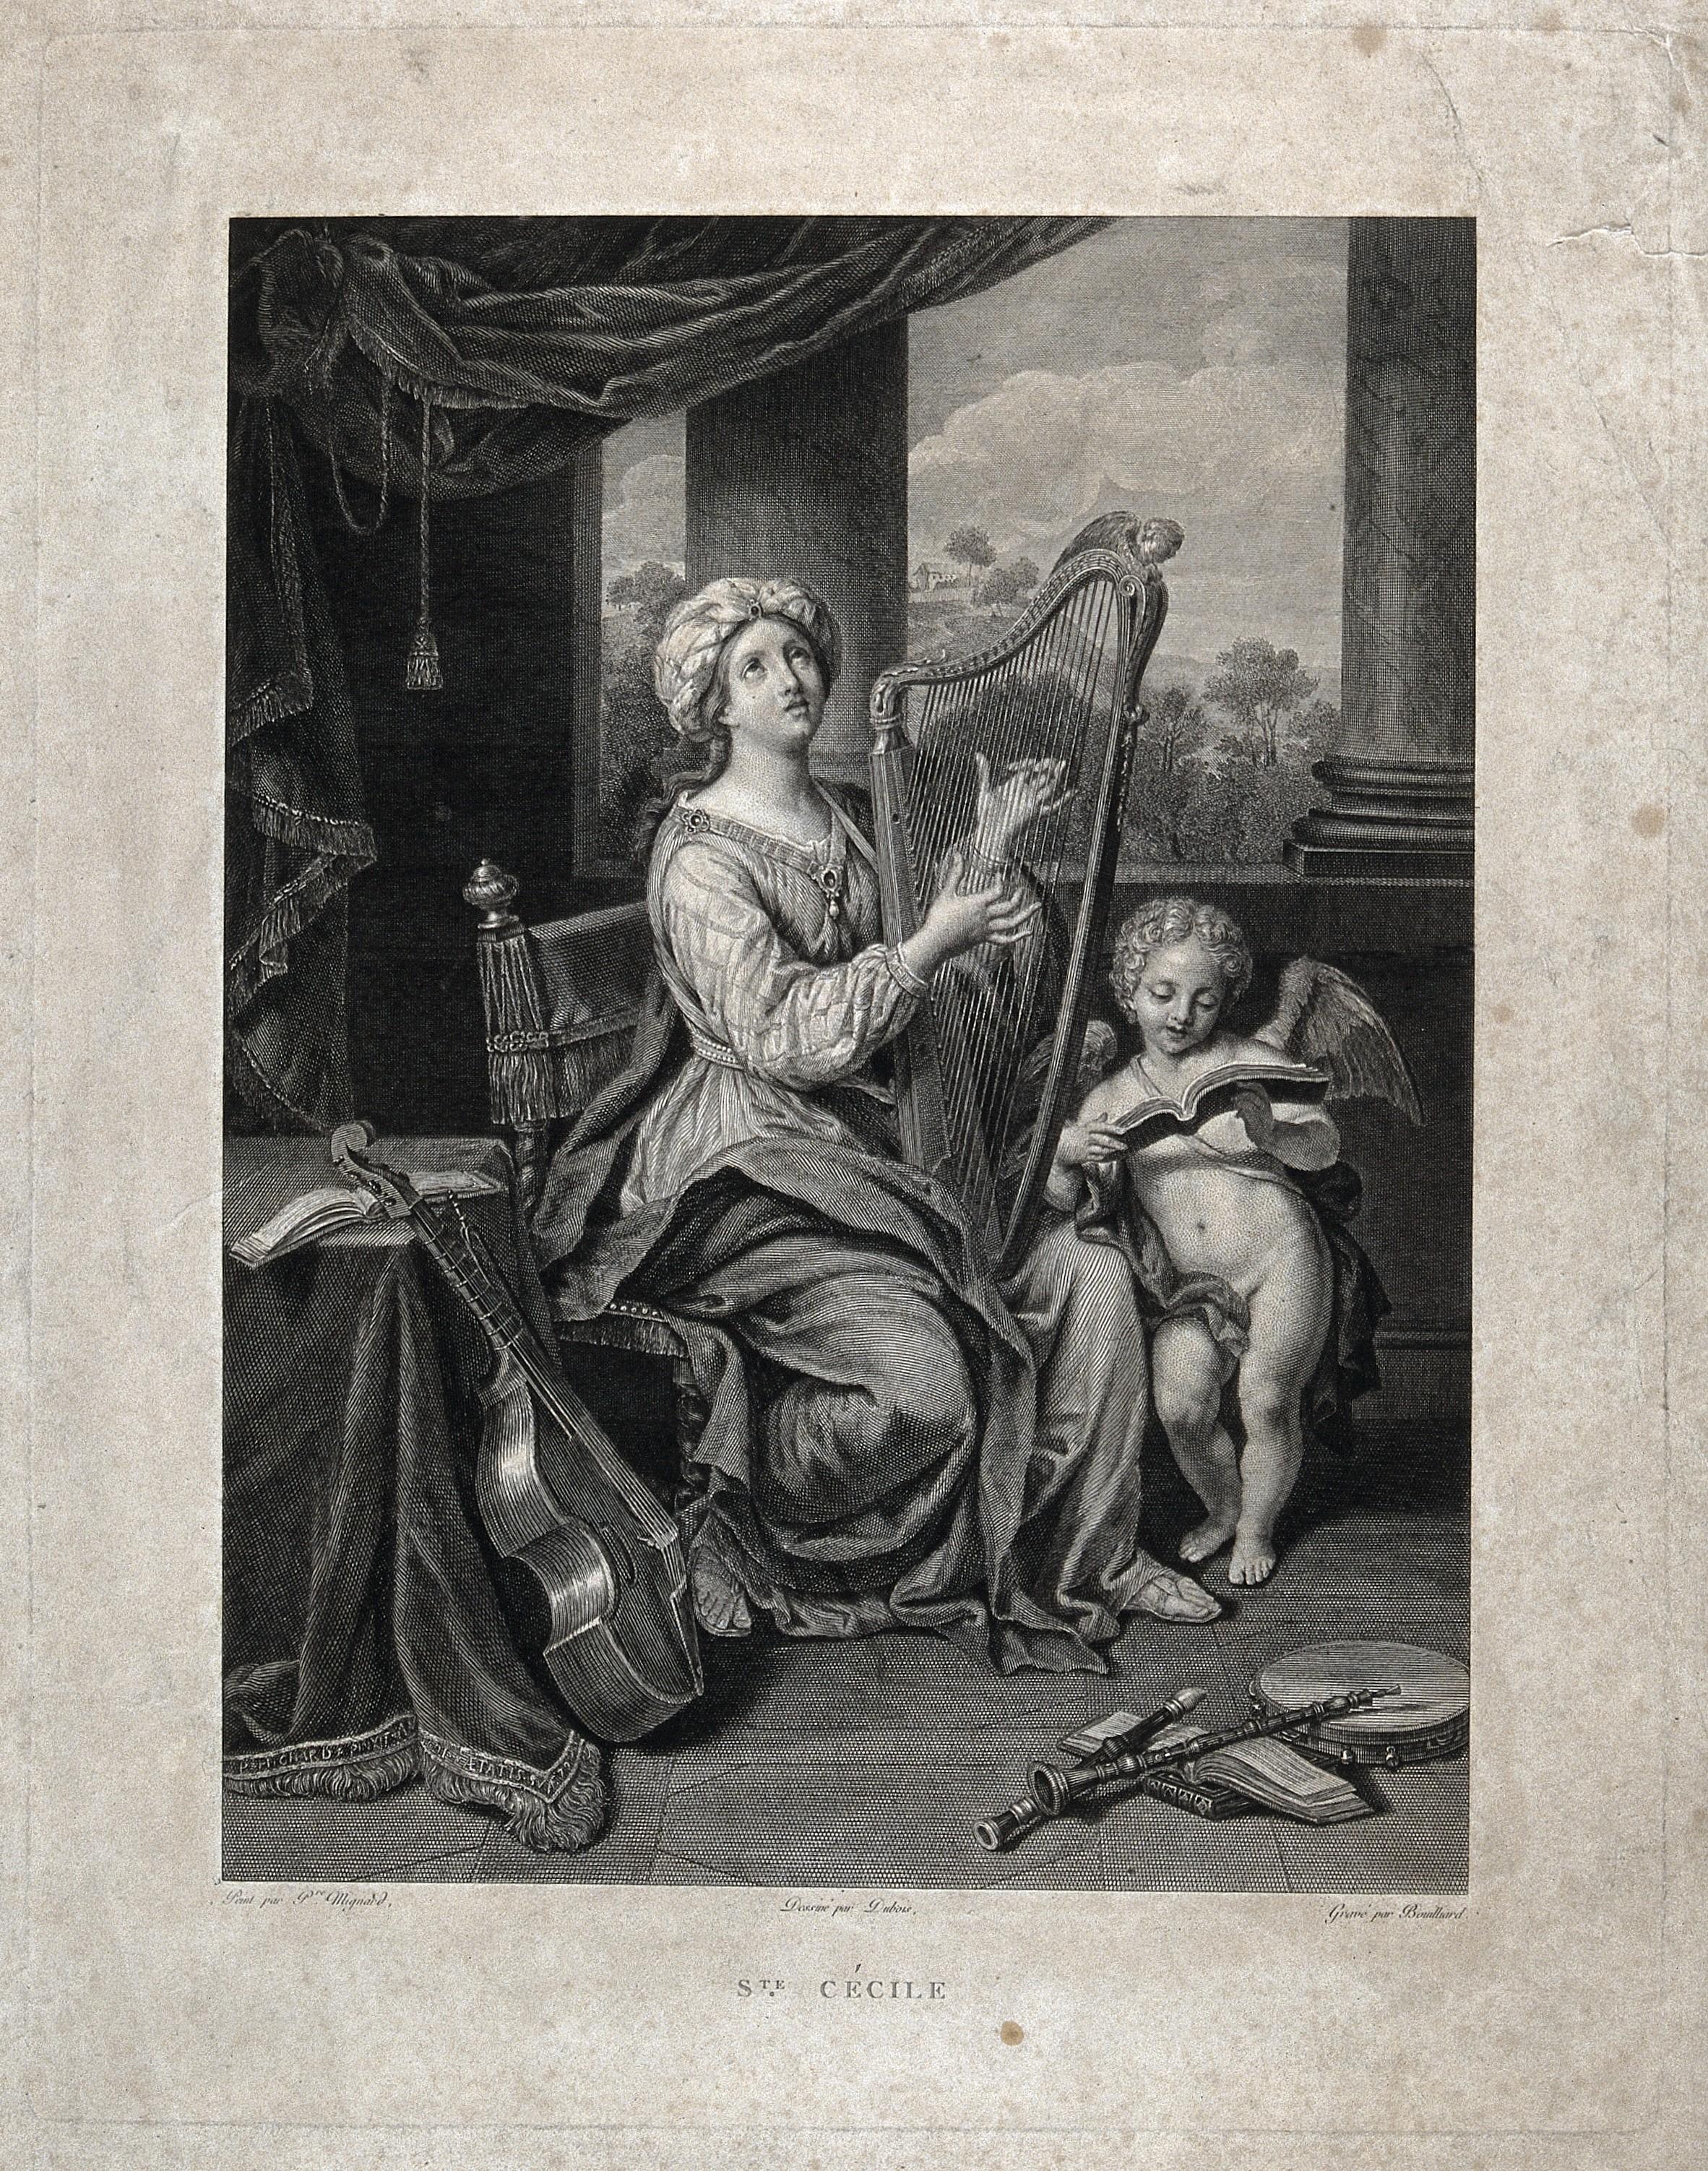 File:Saint Cecilia  Engraving by J  Bouillard after Dubois after